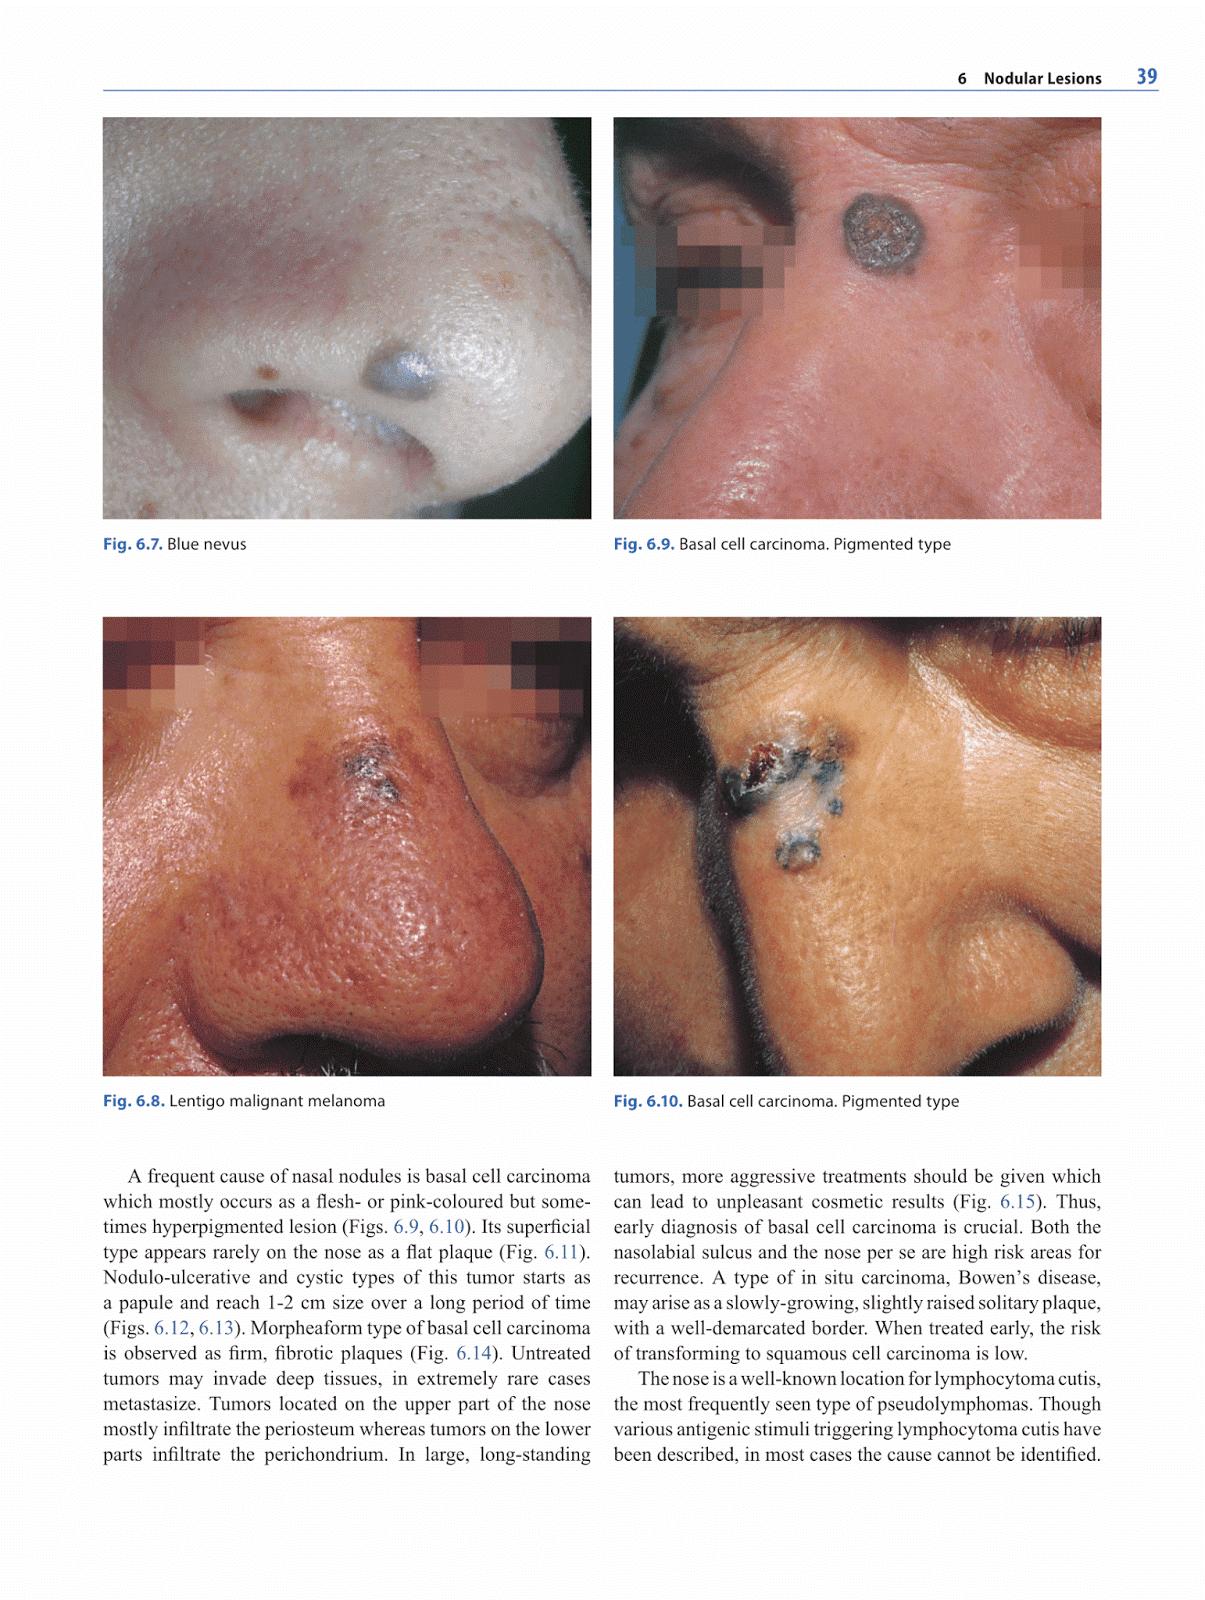 Otolaryngology alexandros sfakianakis lesions of the nose png 1205x1600  Basal cell dermatology encapsulated neuroma cutis